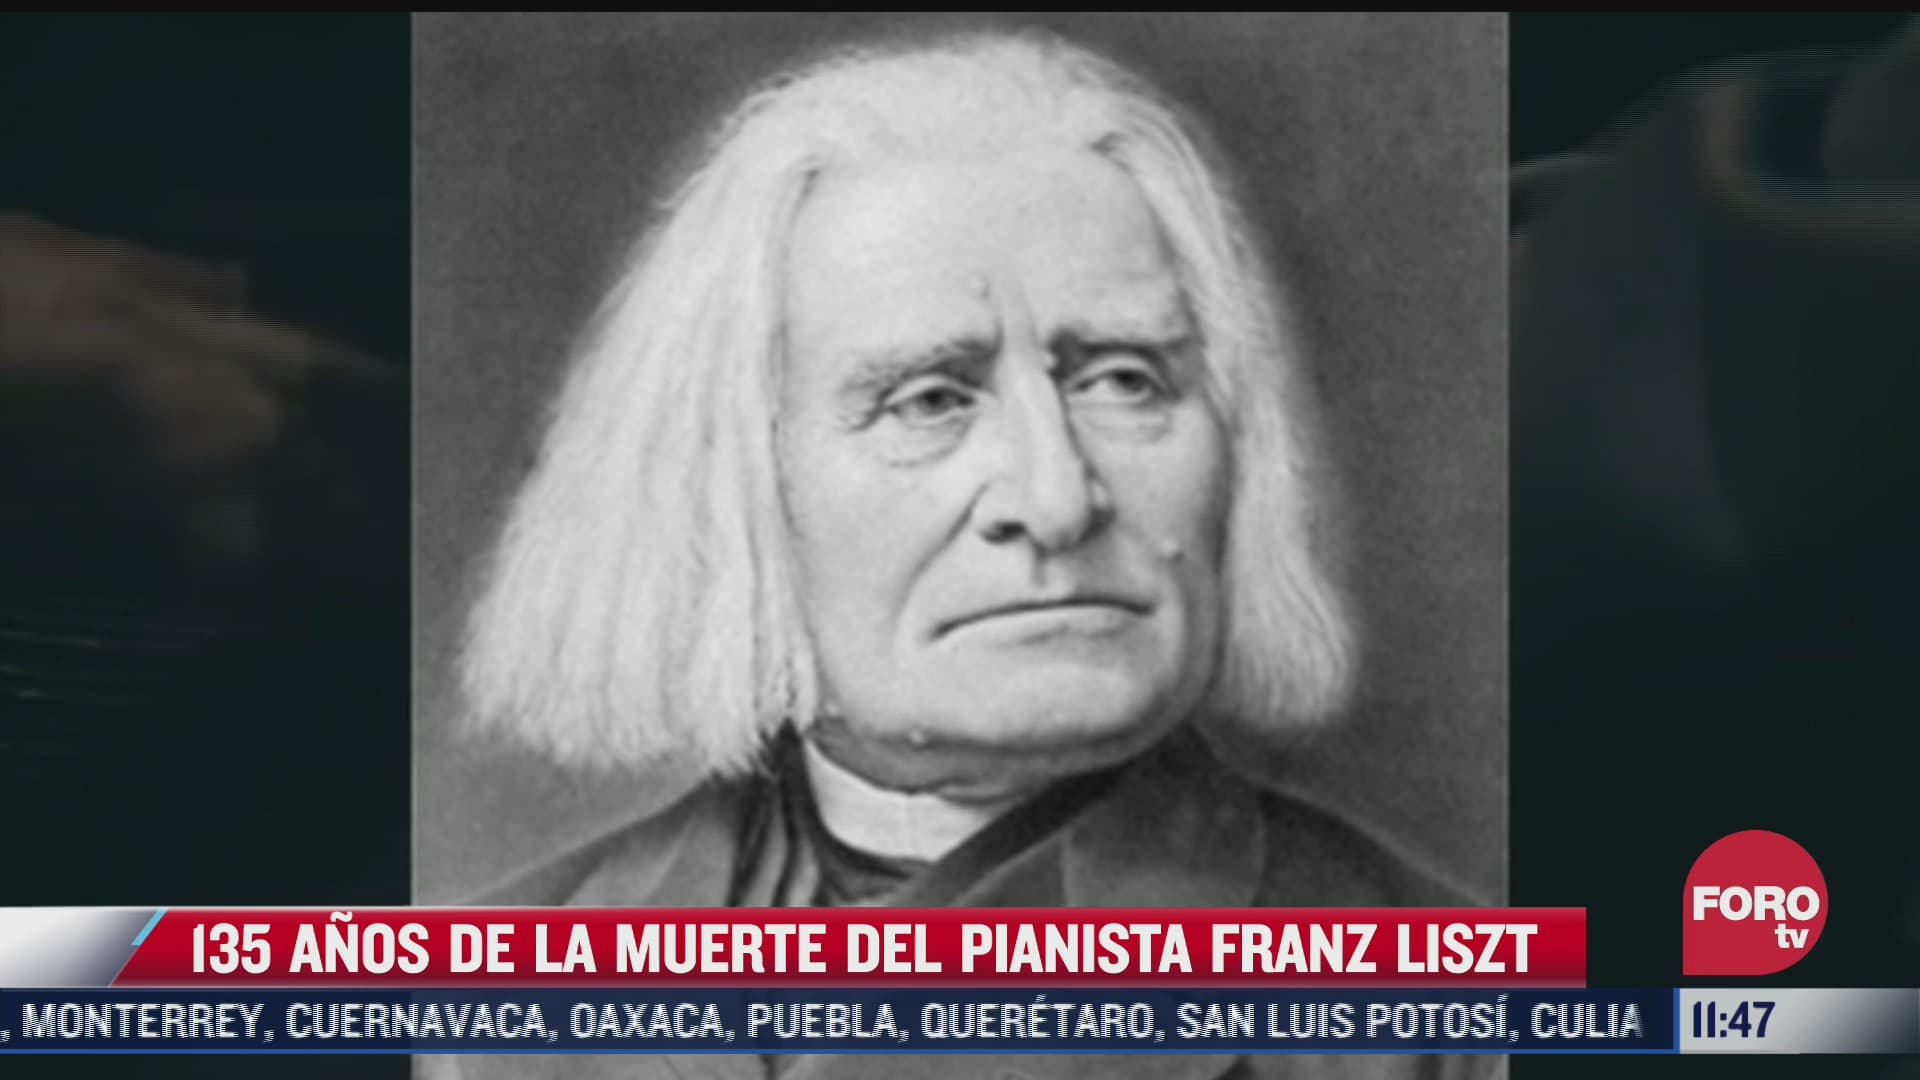 135 anos de la muerte del pianista franz liszt